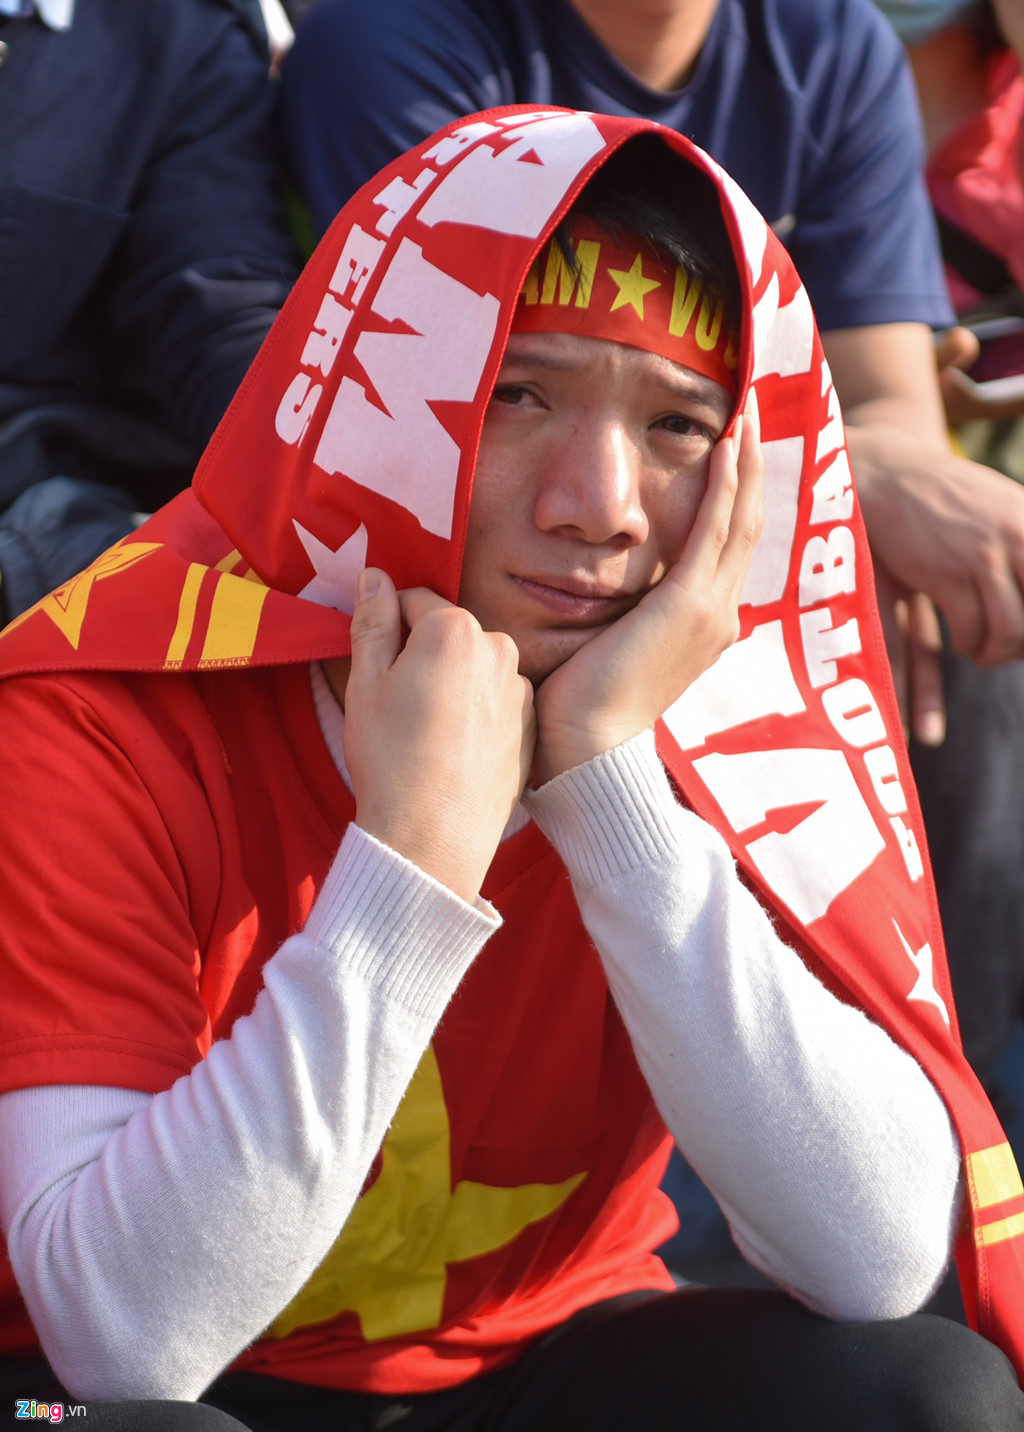 Khoc oa sung suong trong tran thang kho tin truoc U23 Qatar hinh anh 7